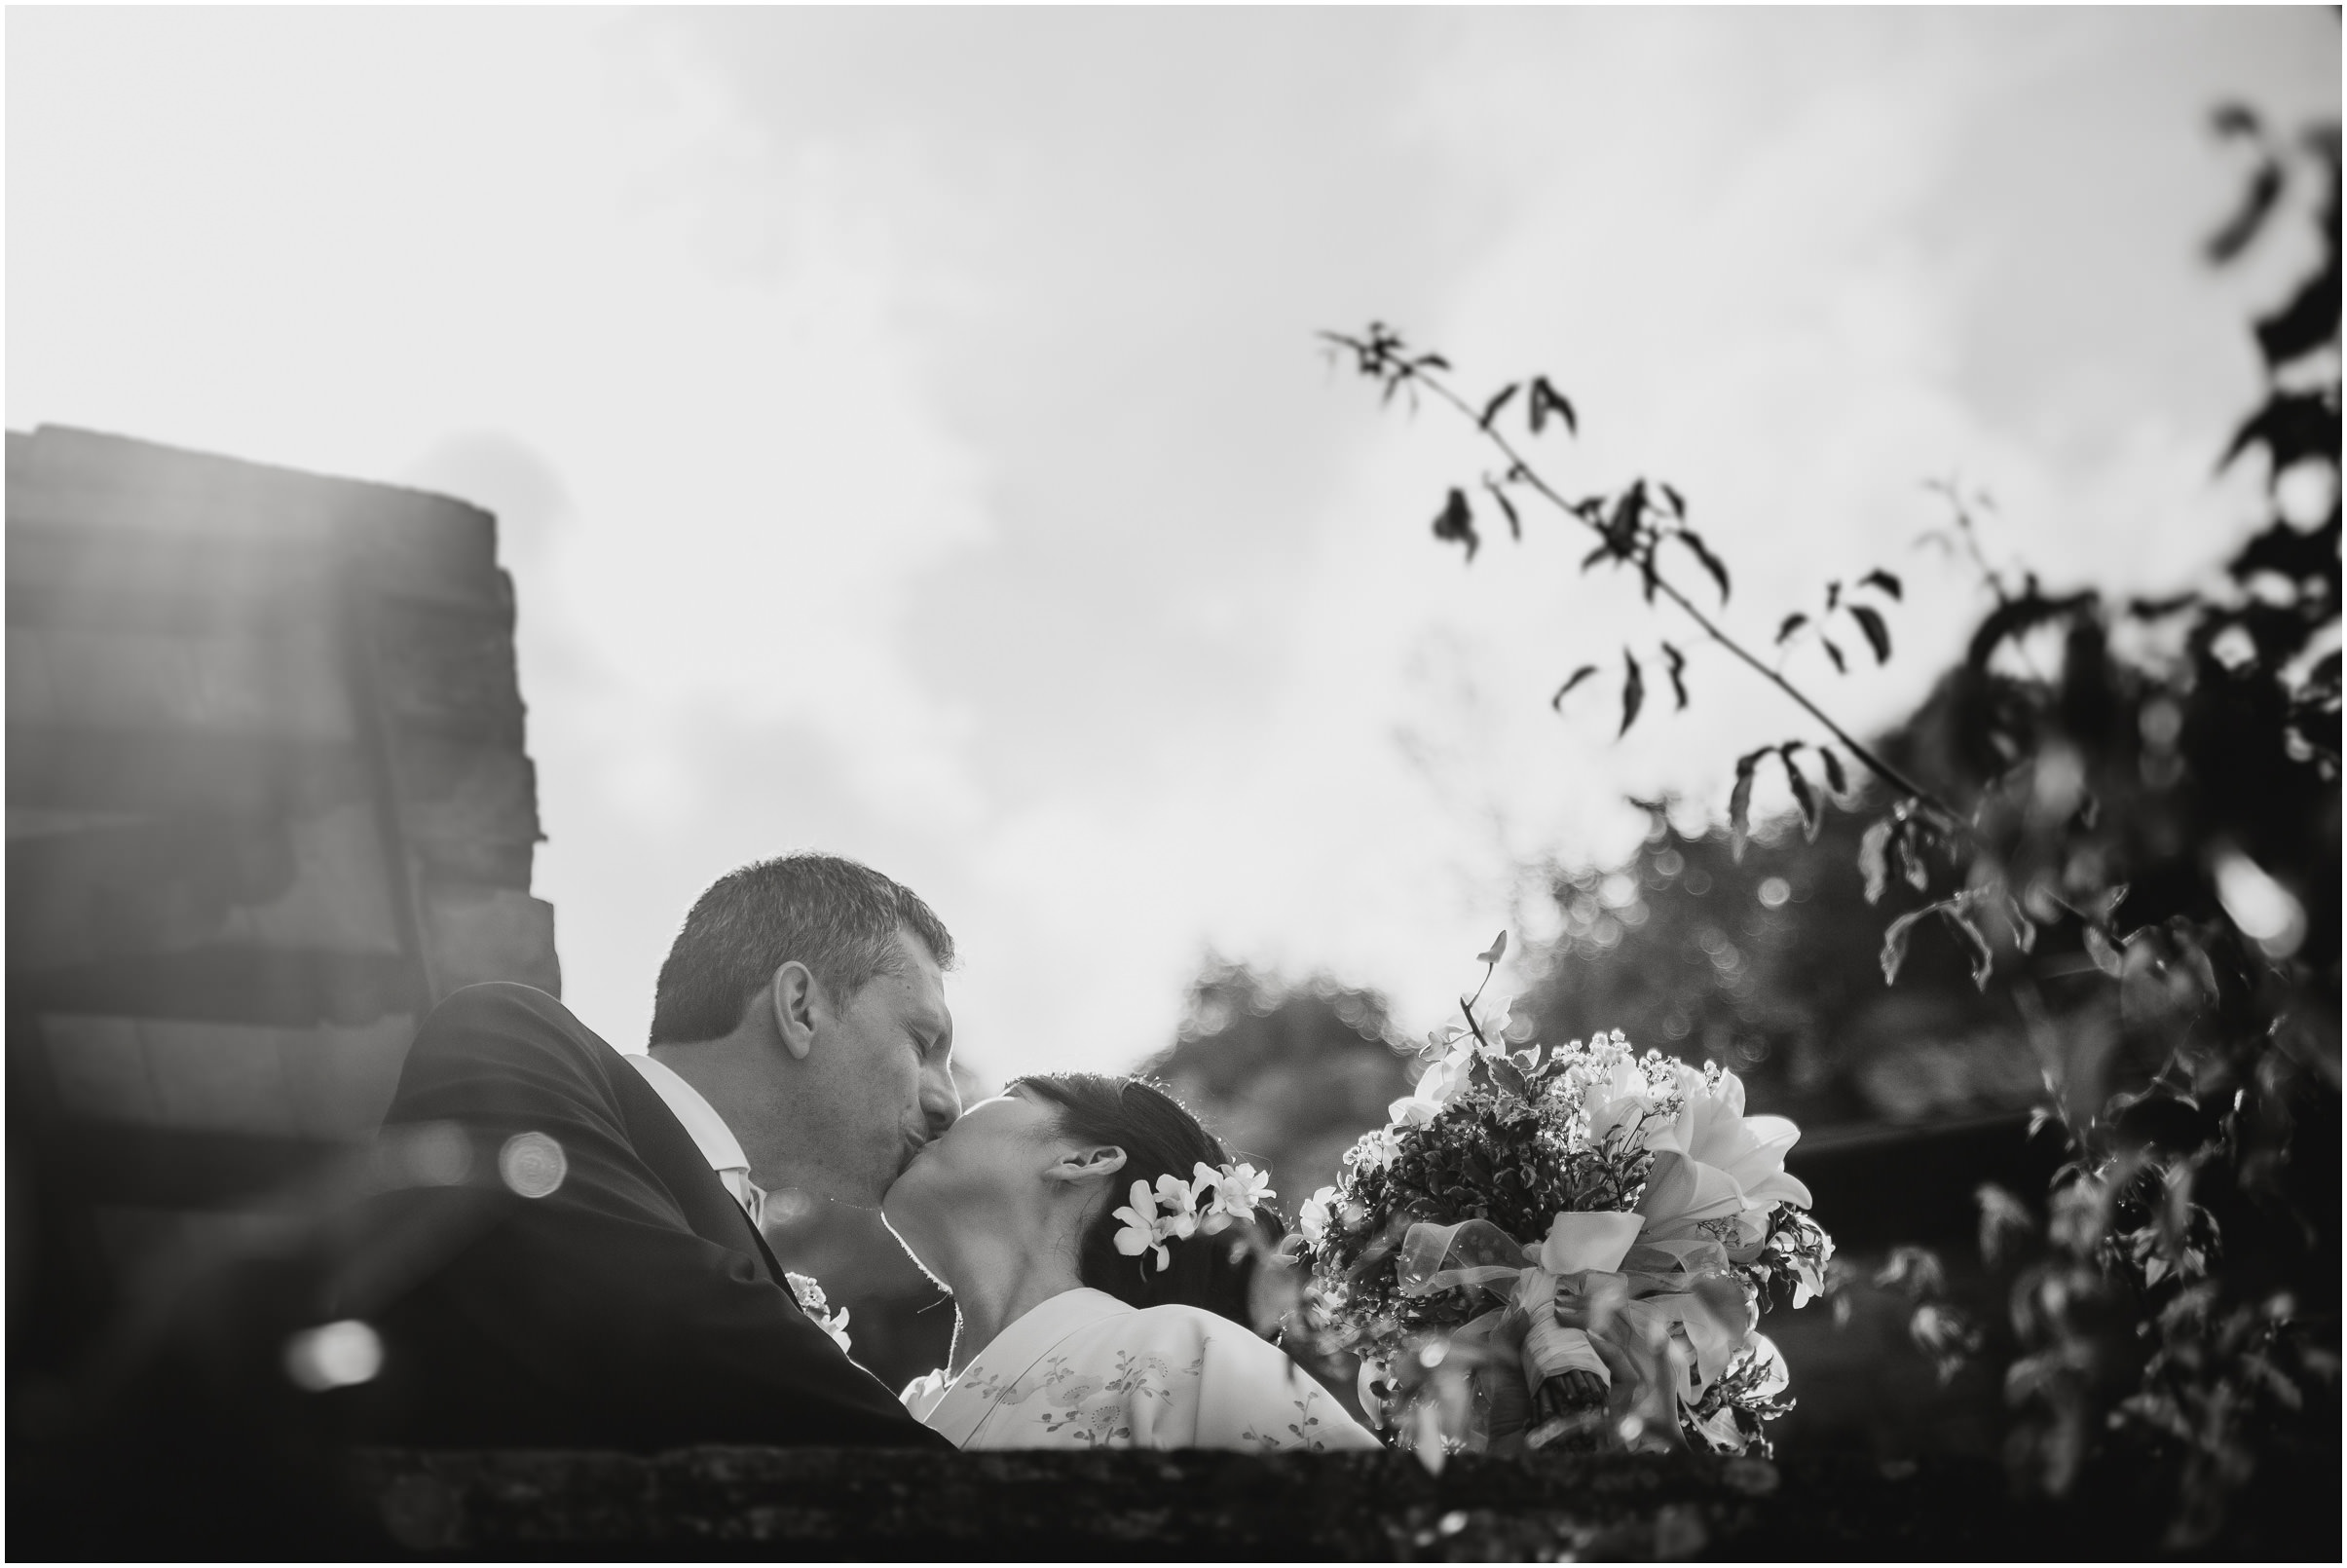 WEDDING-PHOTOGRAPHY-SARA-LORENZONI-FOTOGRAFIA-MATRIMONIO-ORVIETO-JUKA-ANTONELLO36